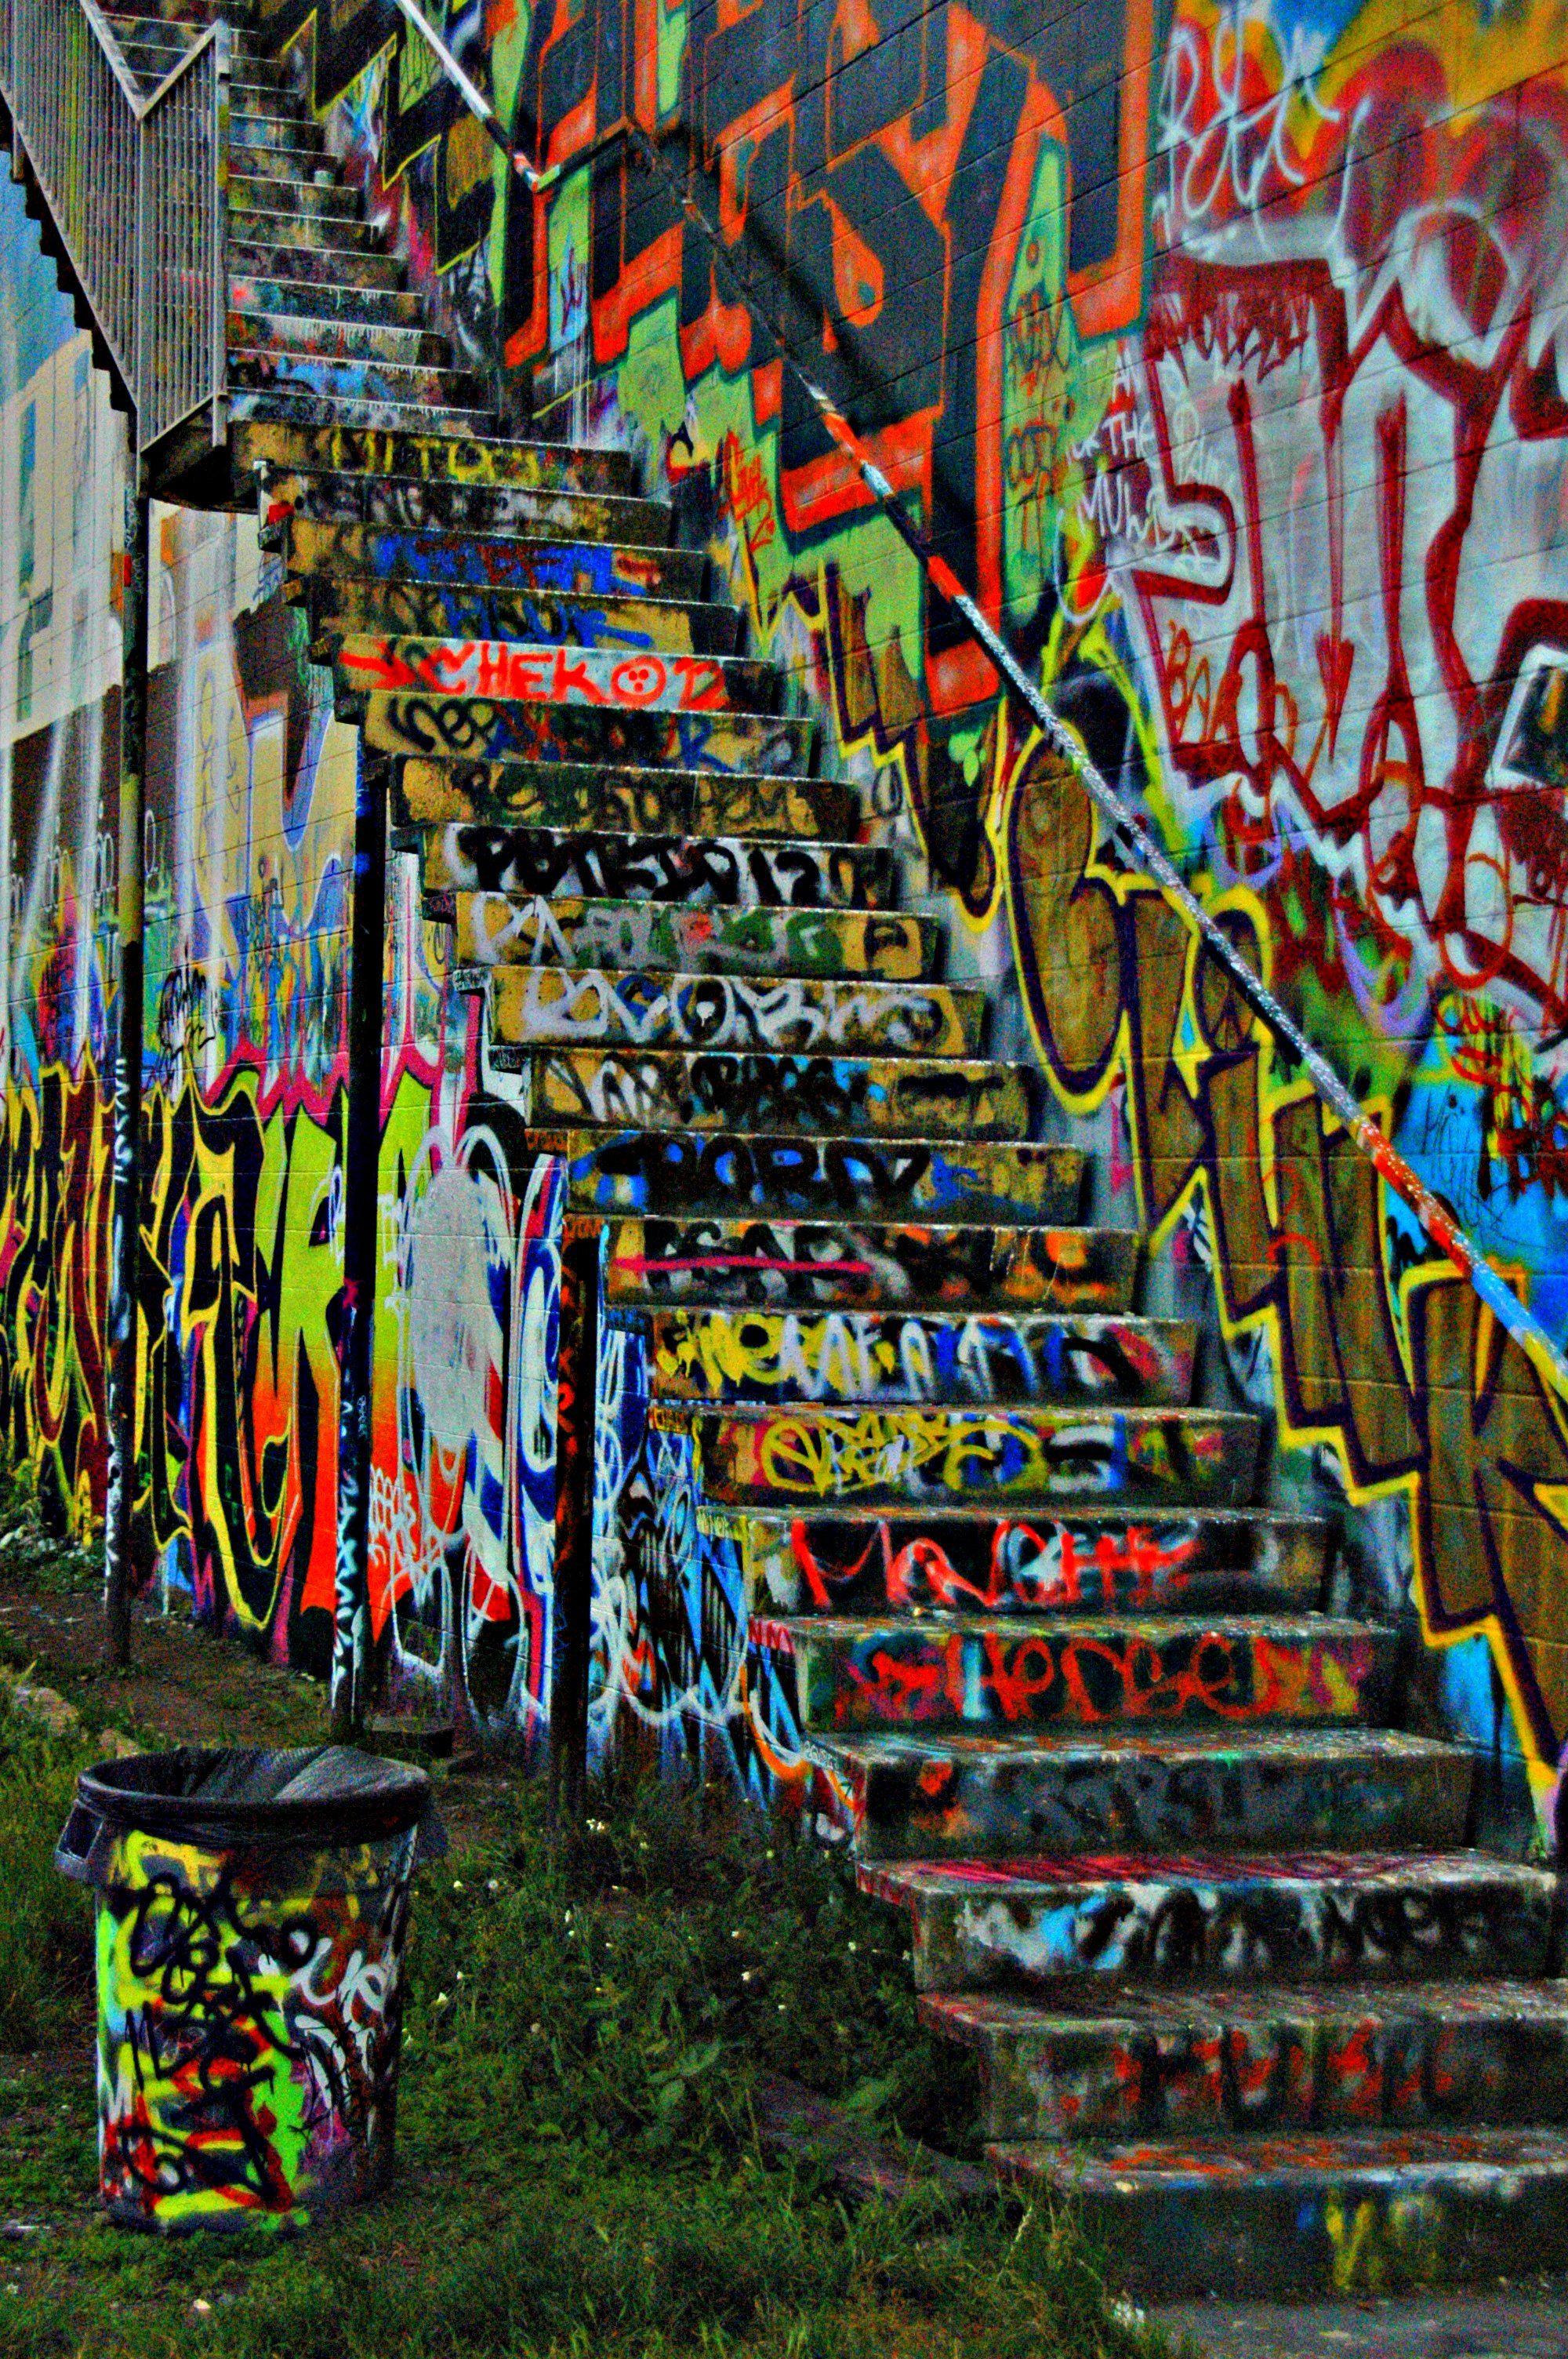 Graffiti wall christchurch - Graffiti Wall In Seattle 3